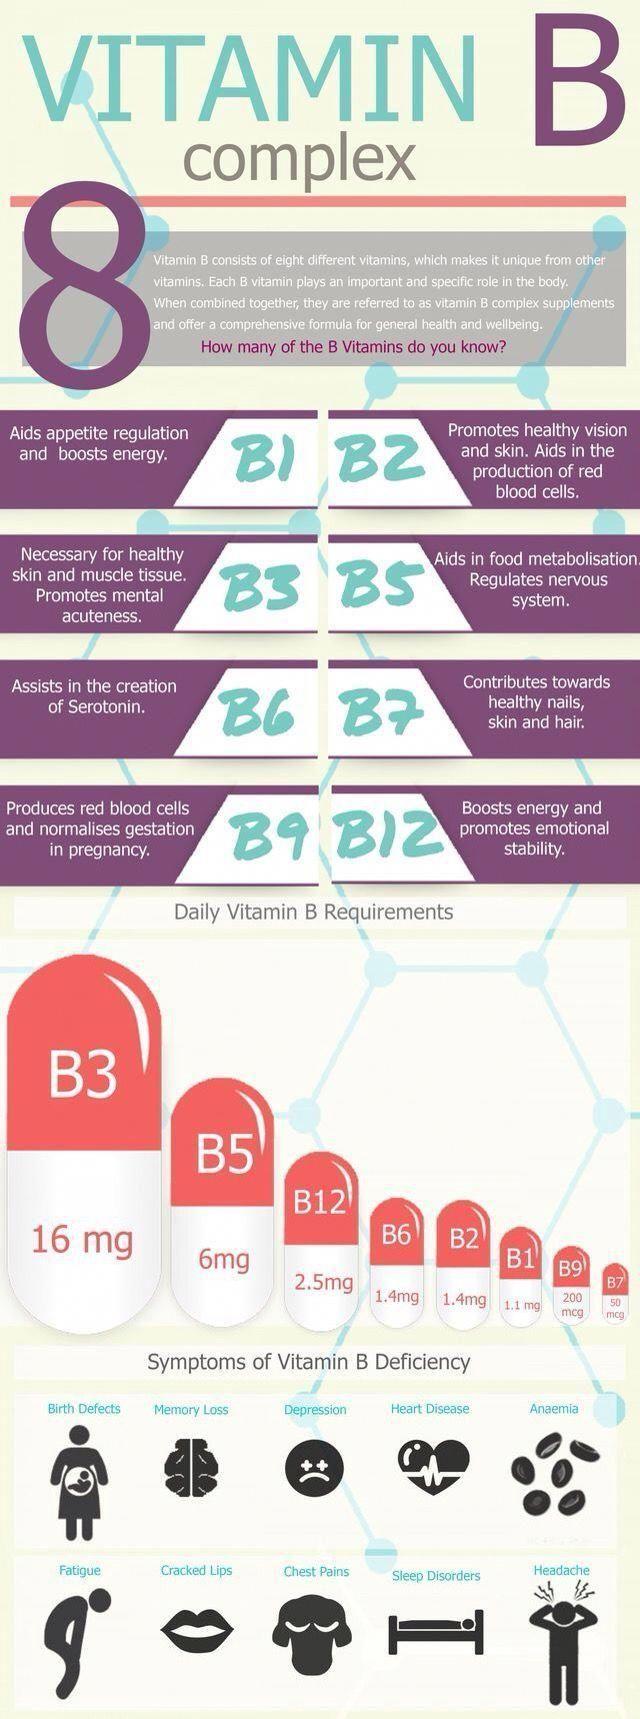 vitamin B complex facts benefits Health ,